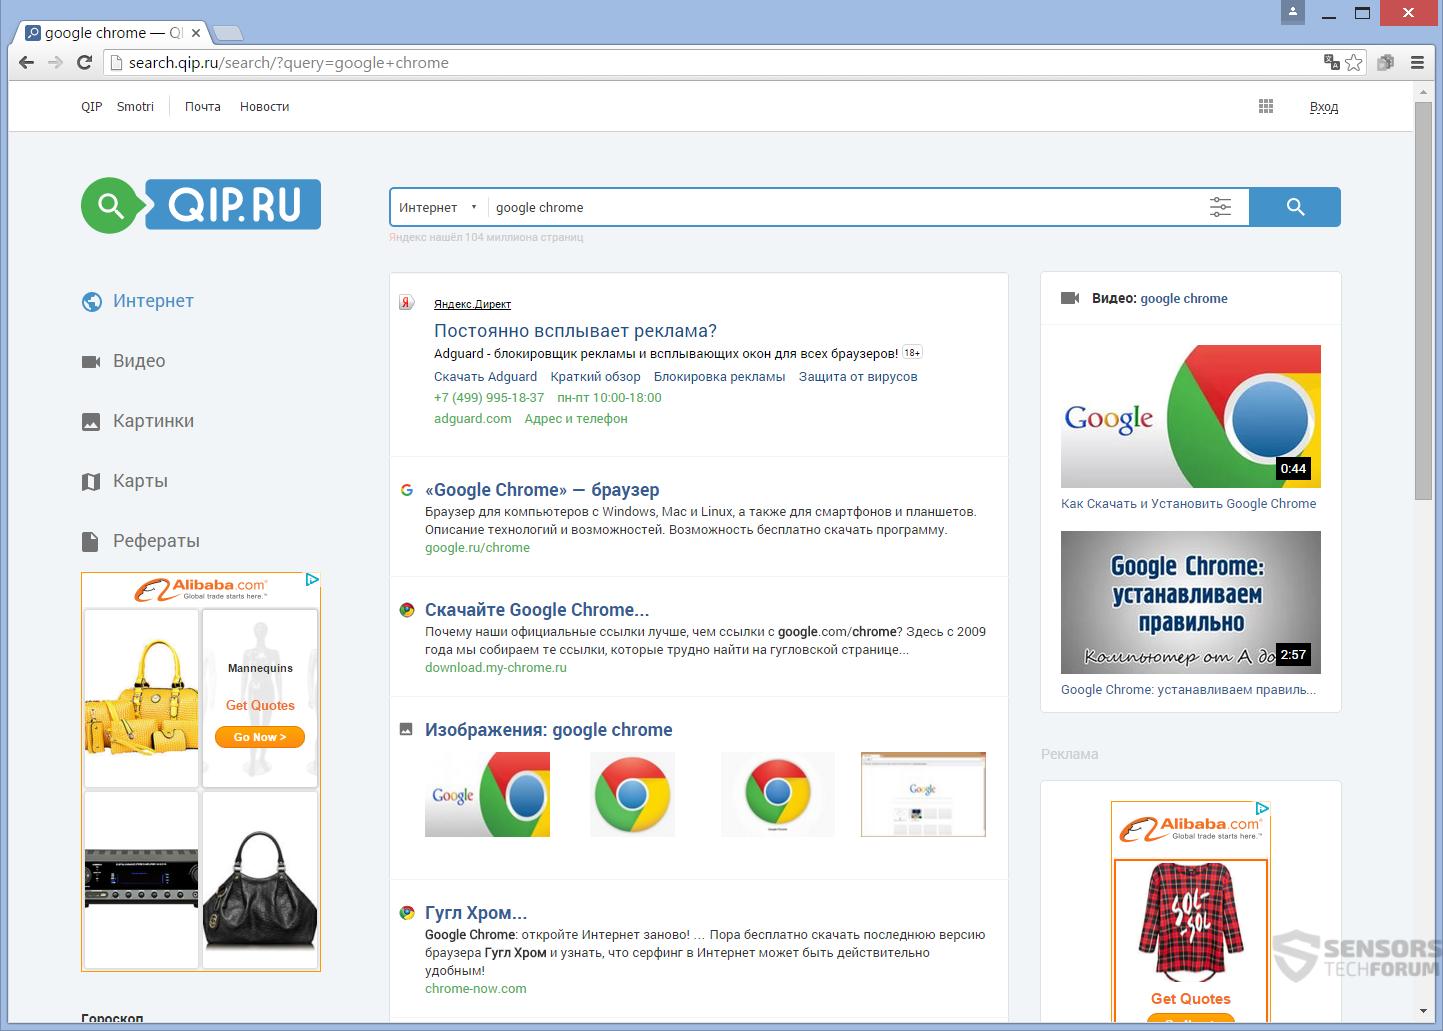 SensorsTechForum-search-qip-ru-search-results-advertisements-ads